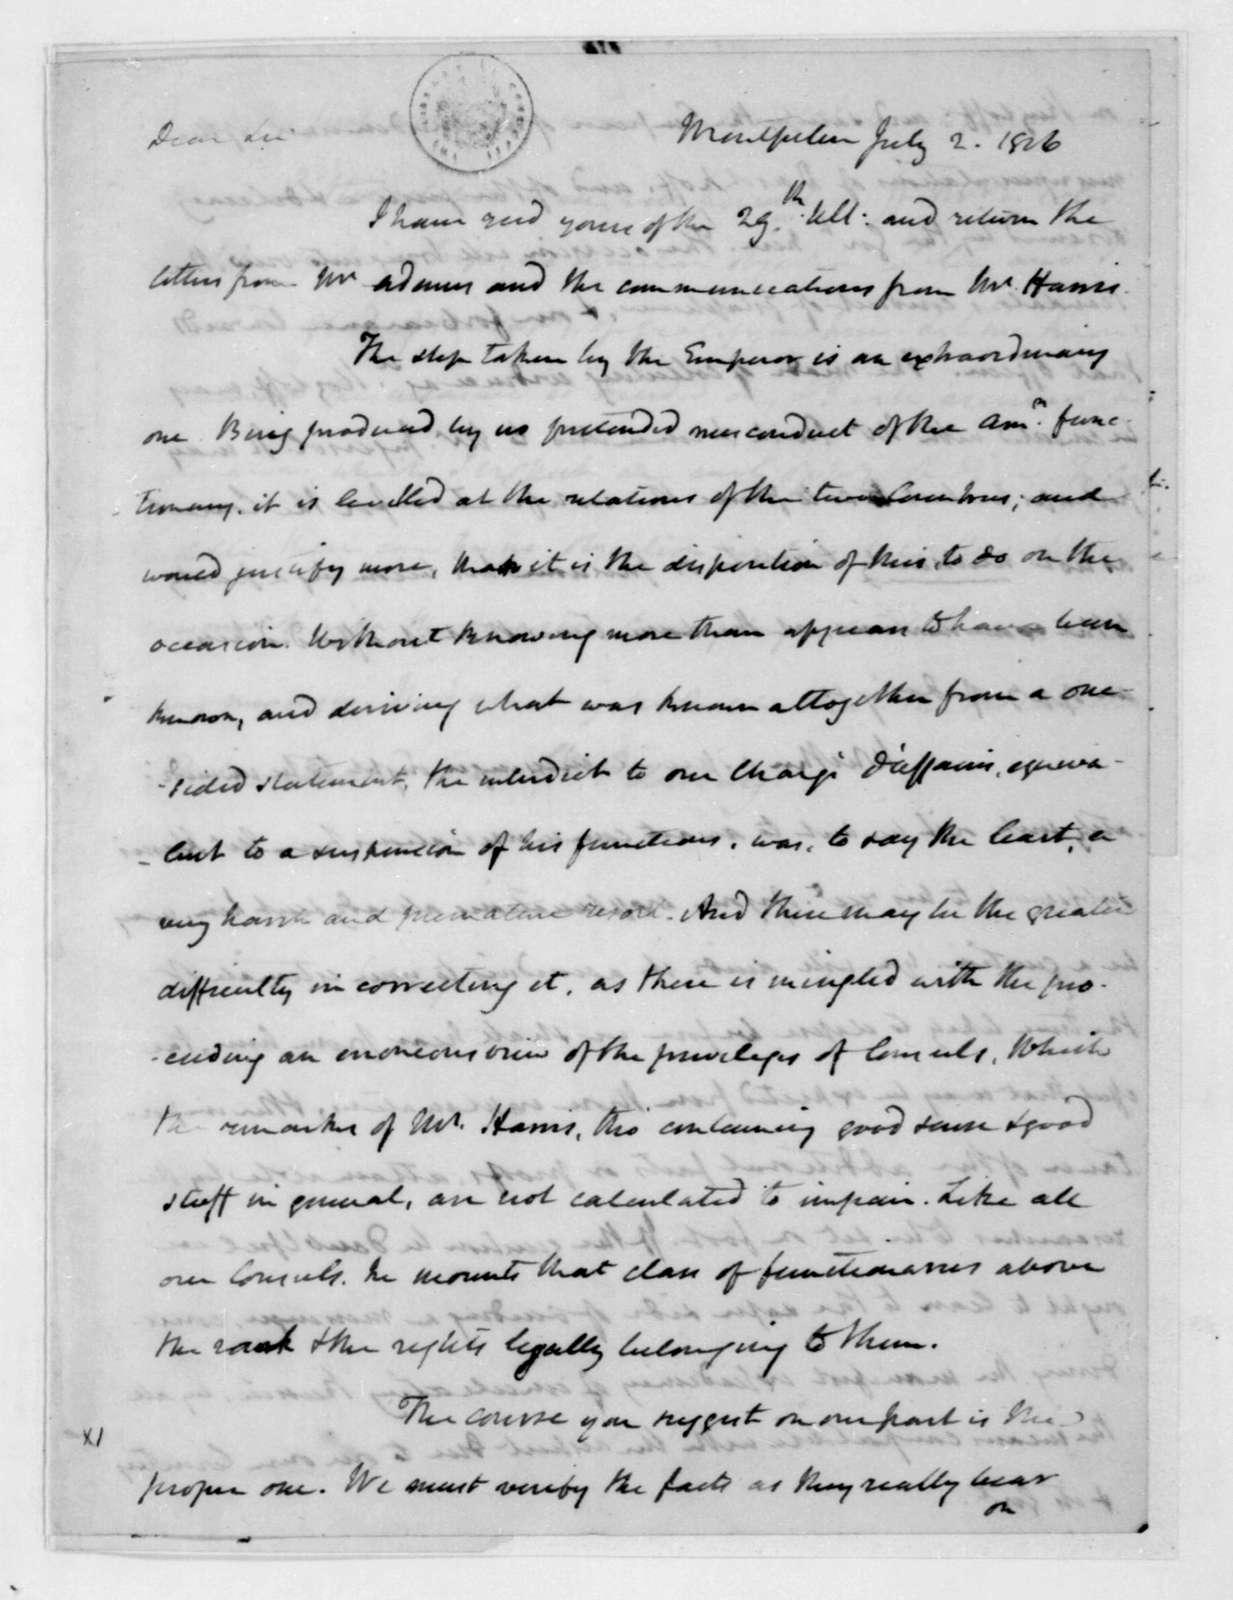 James Madison to James Monroe, July 2, 1816.